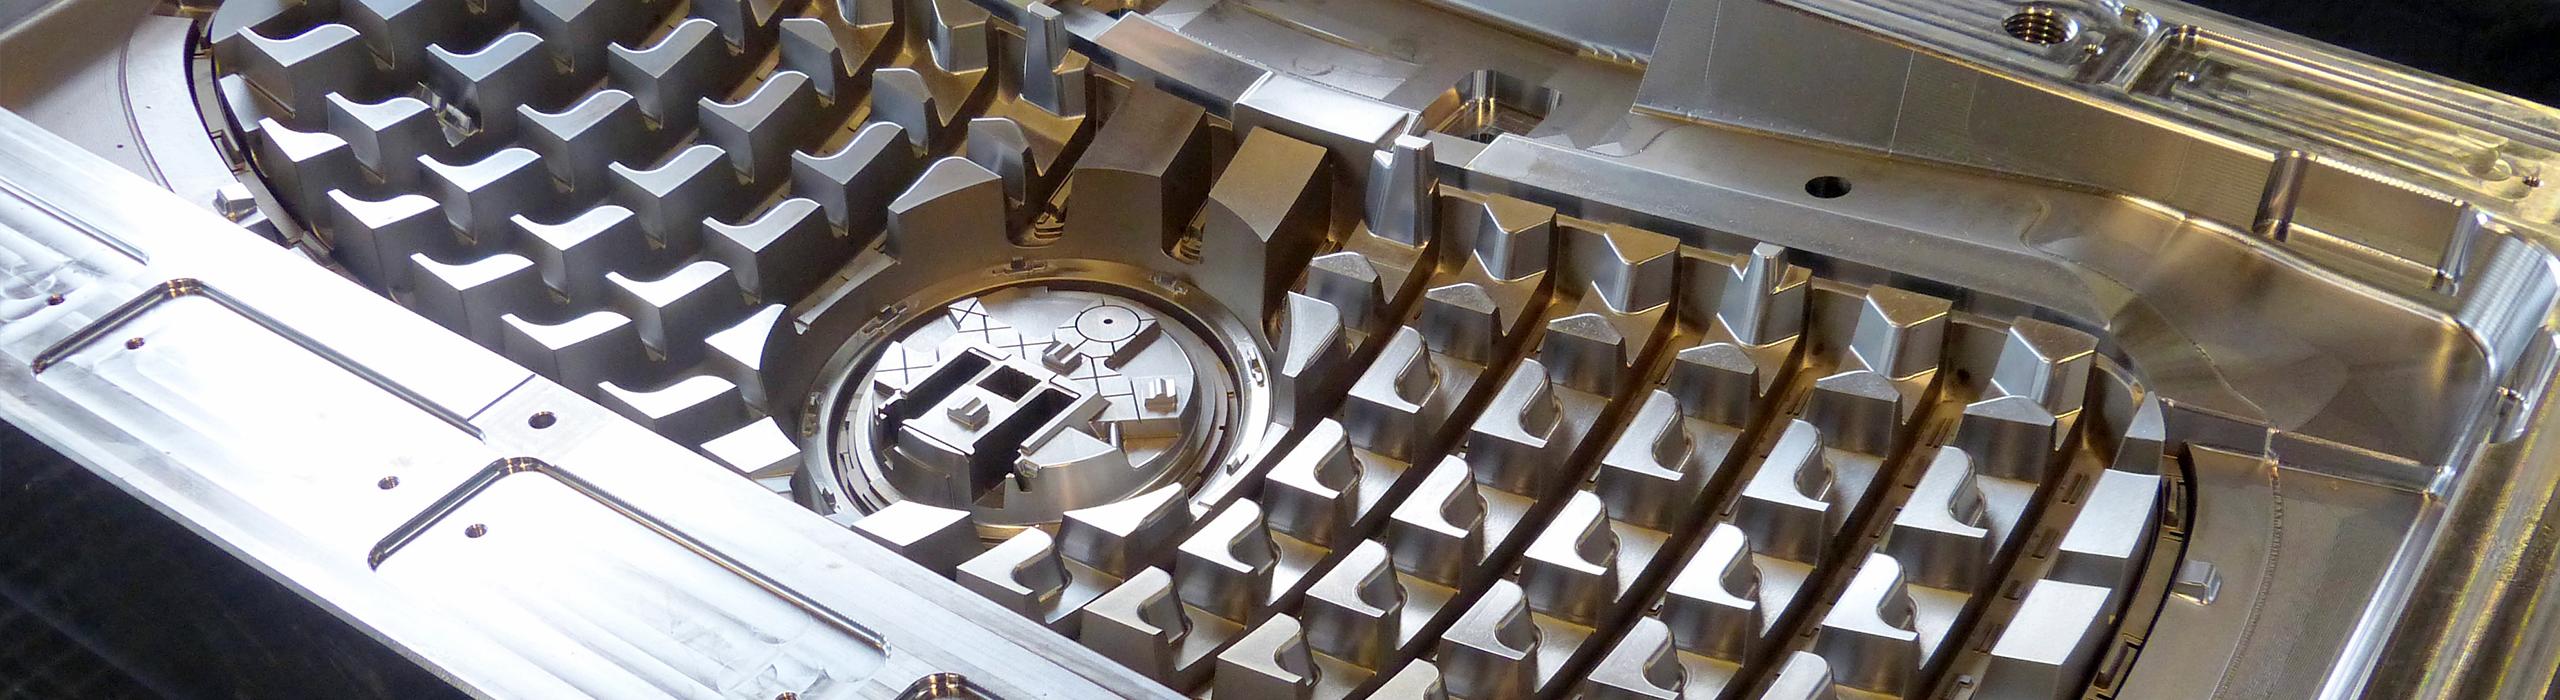 RSB-Stahl-formenbau-header2